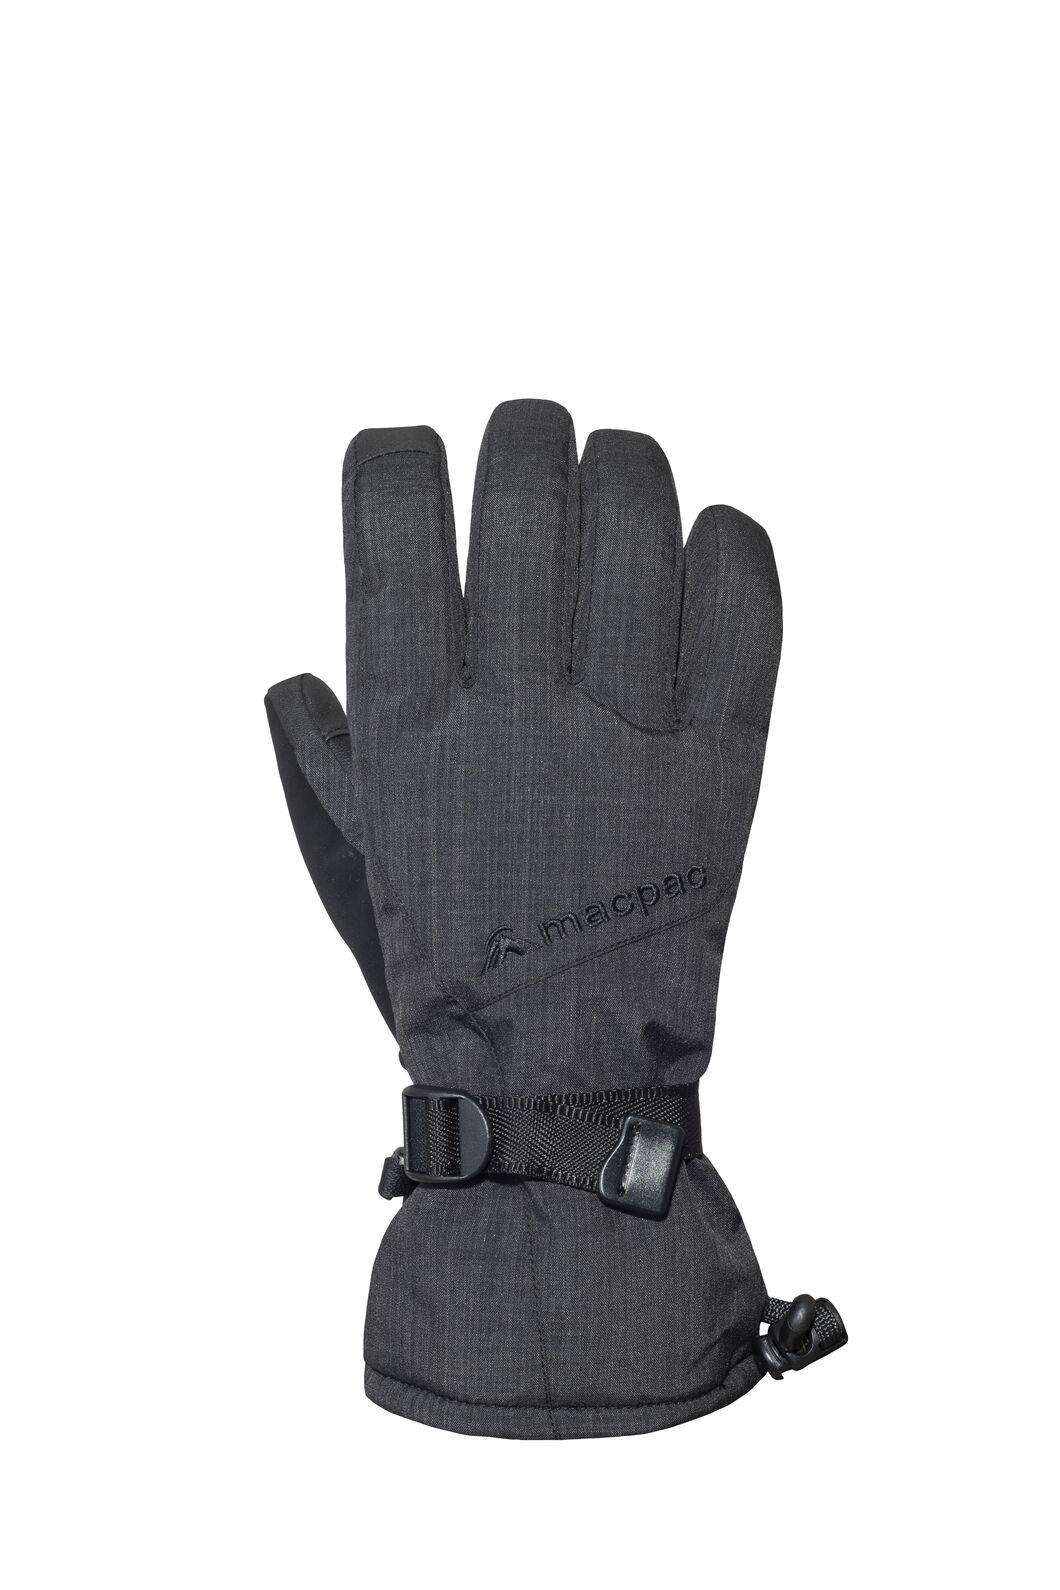 Macpac Carve Gloves, Black, hi-res